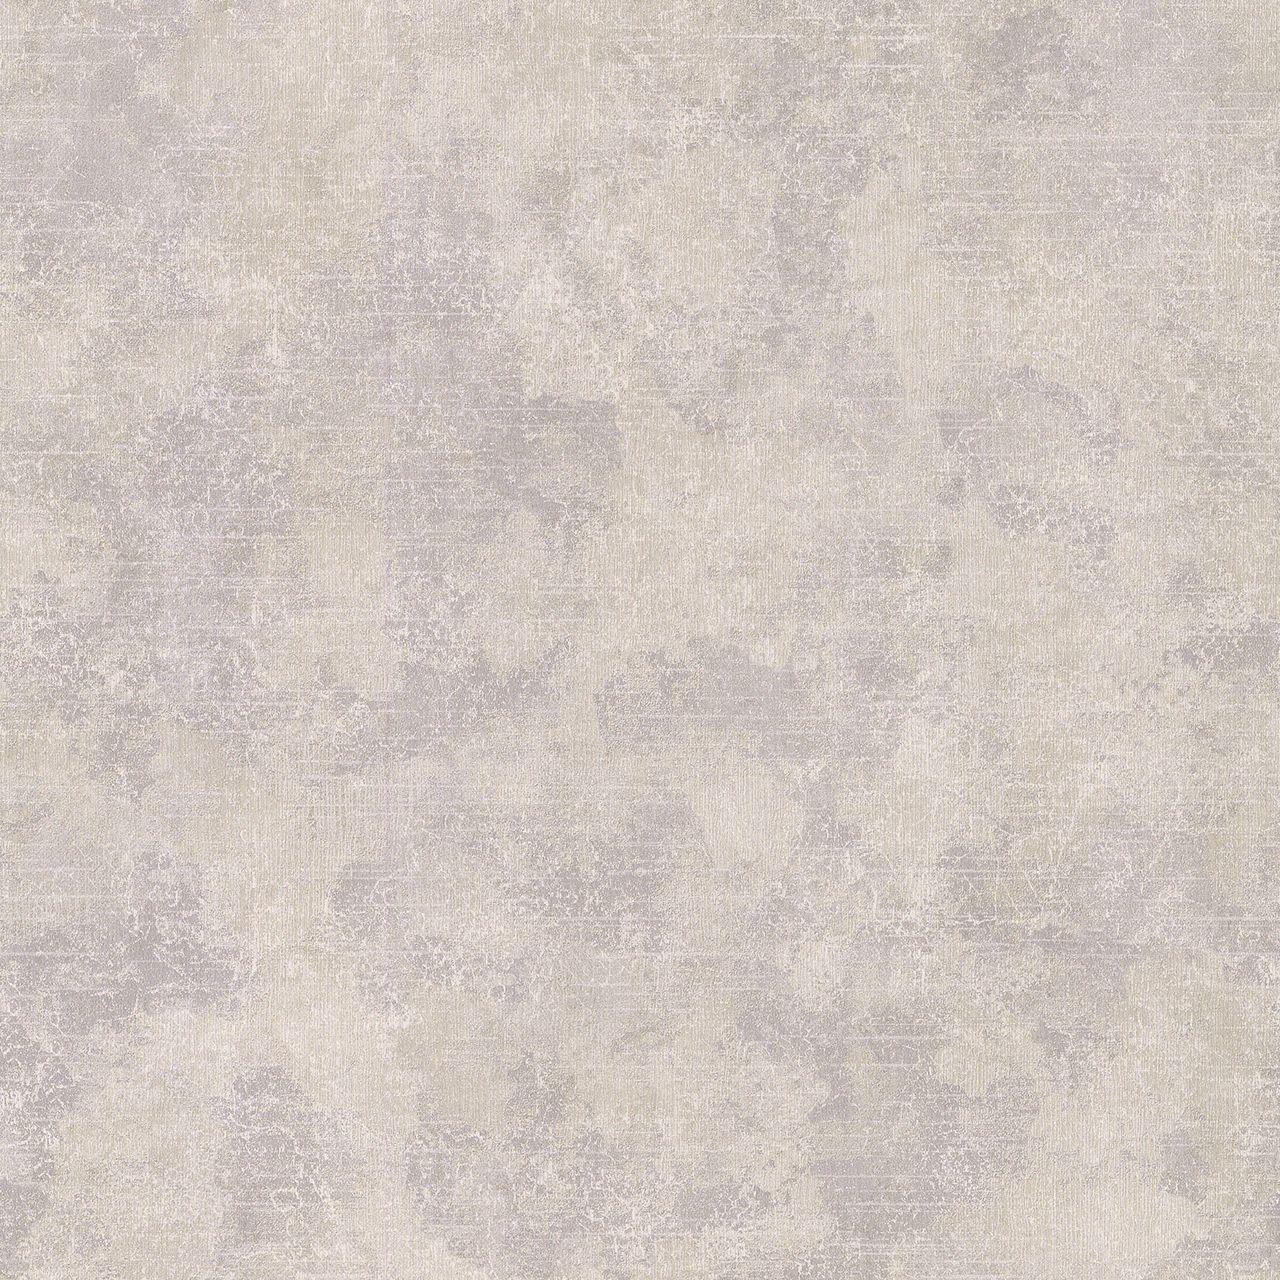 2623001363Halstead Mauve Rag Texture Textured